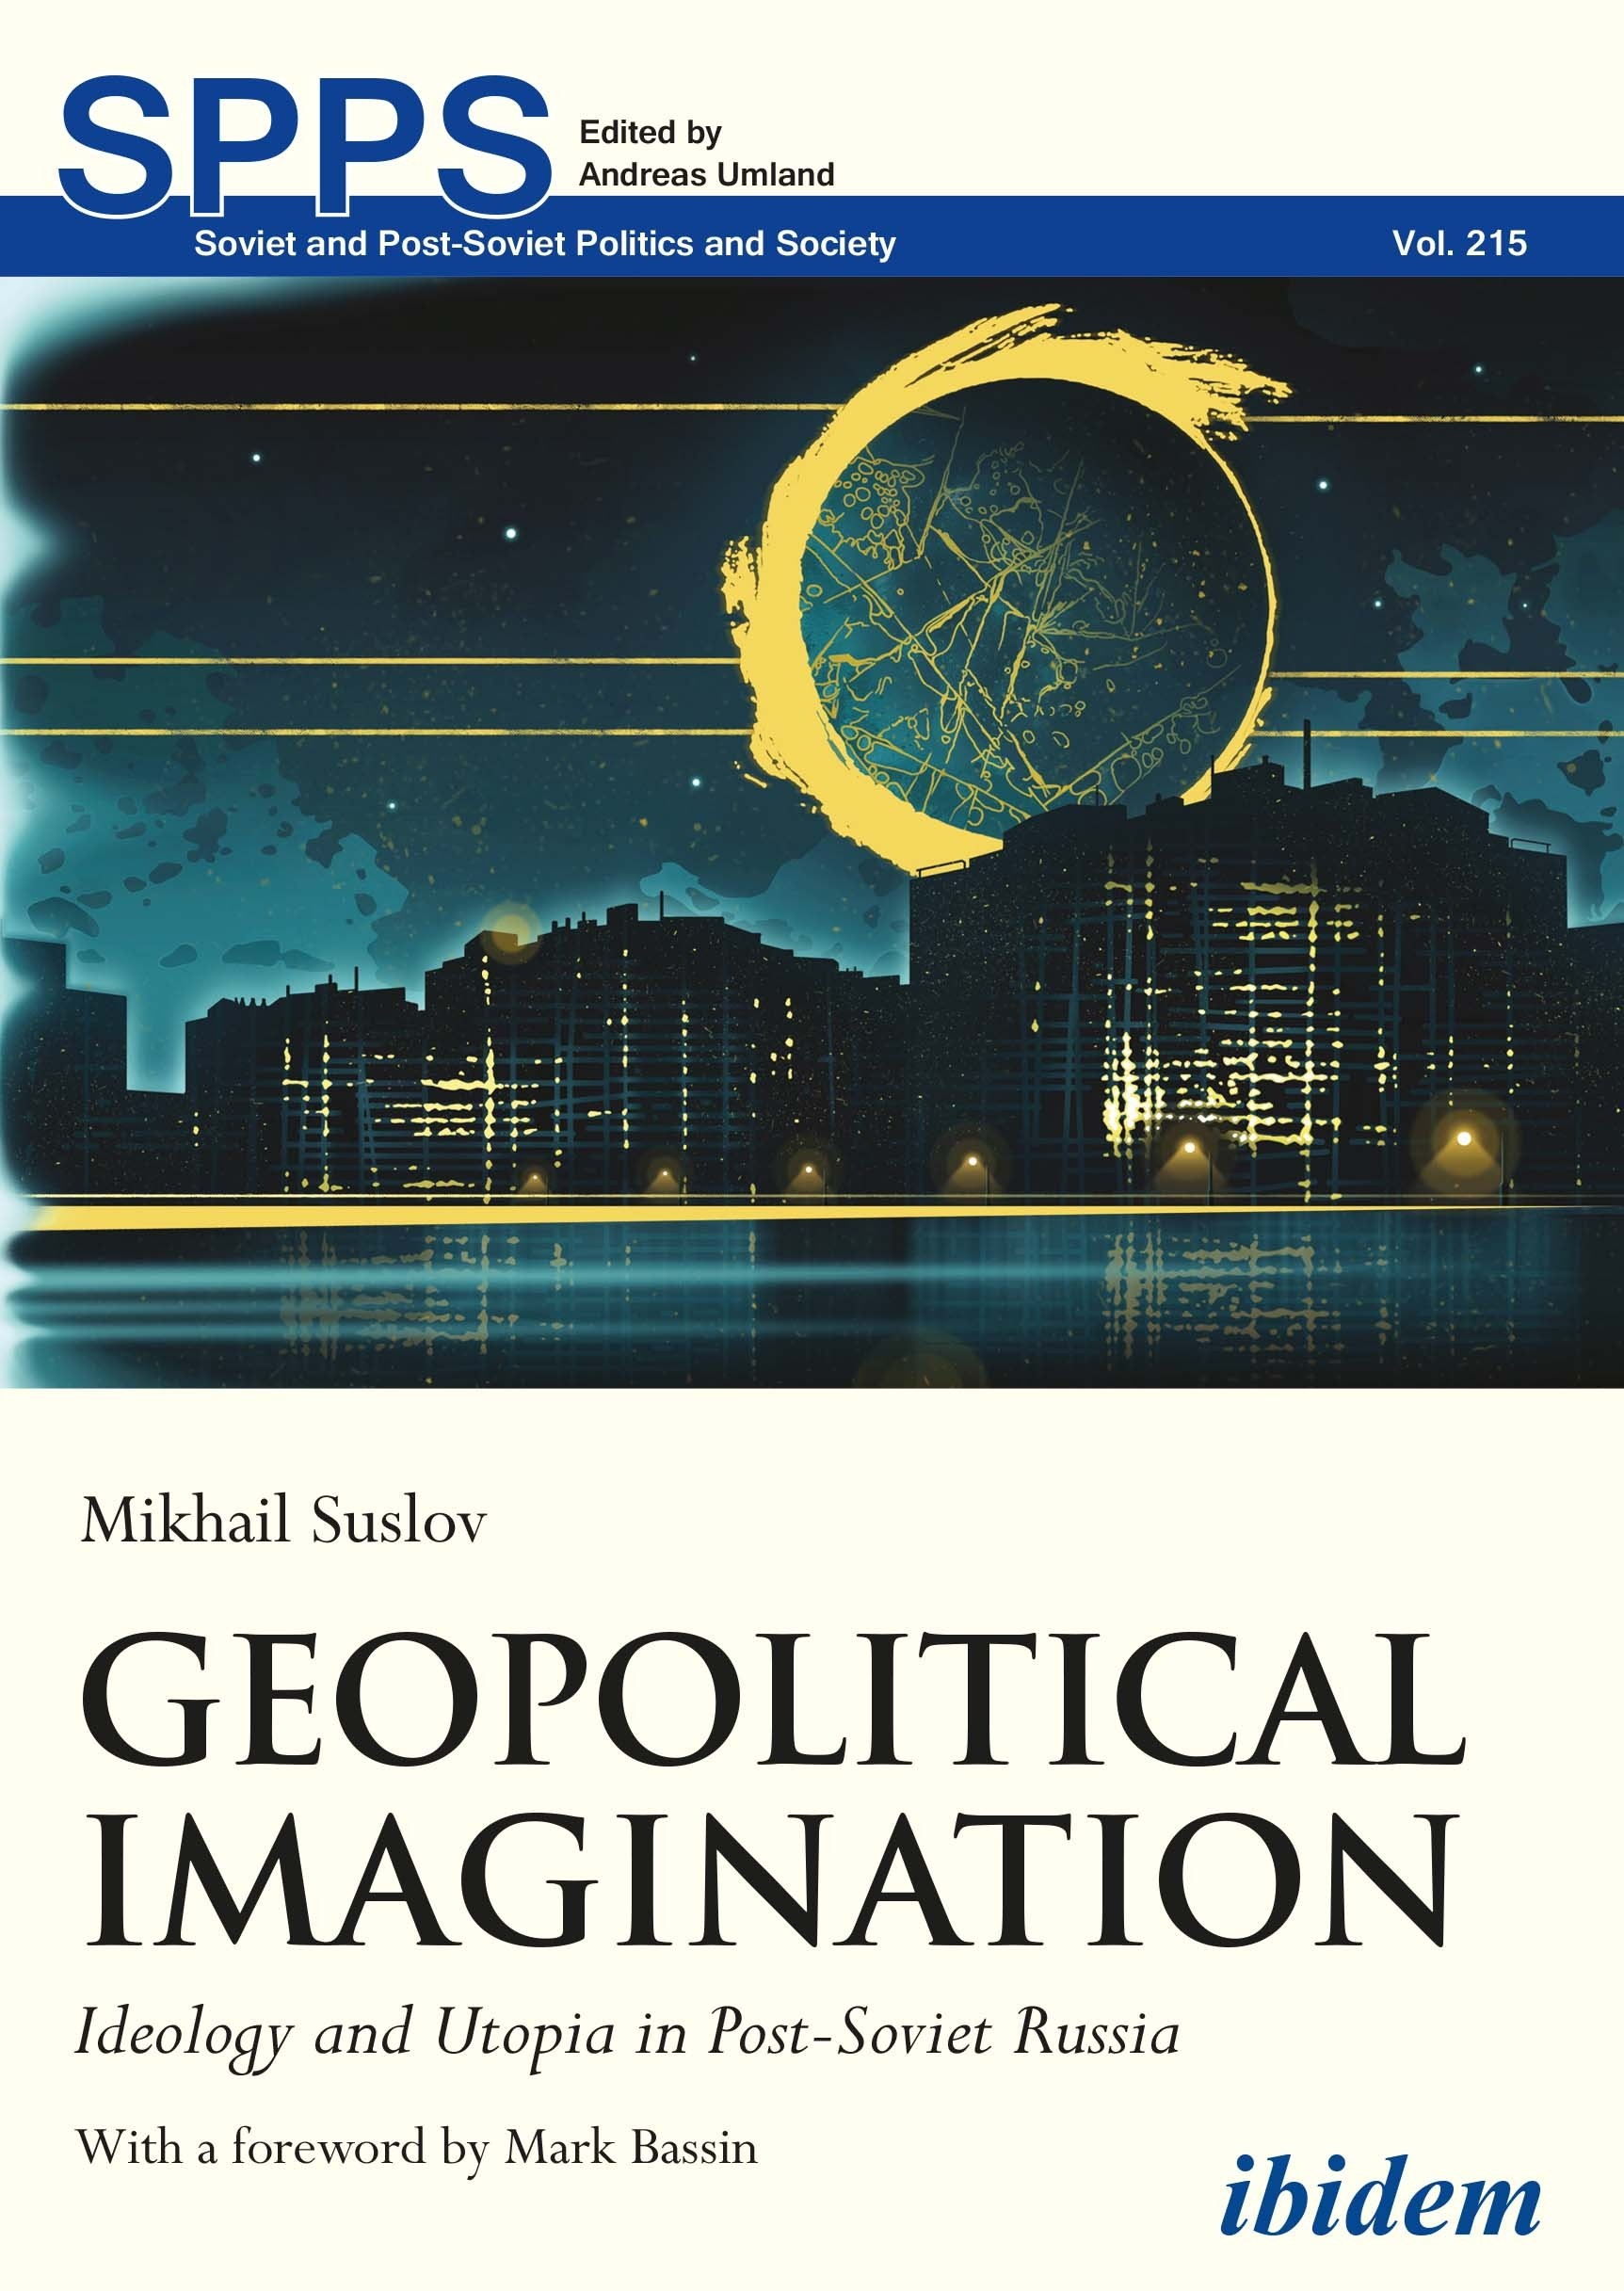 Geopolitical Imagination